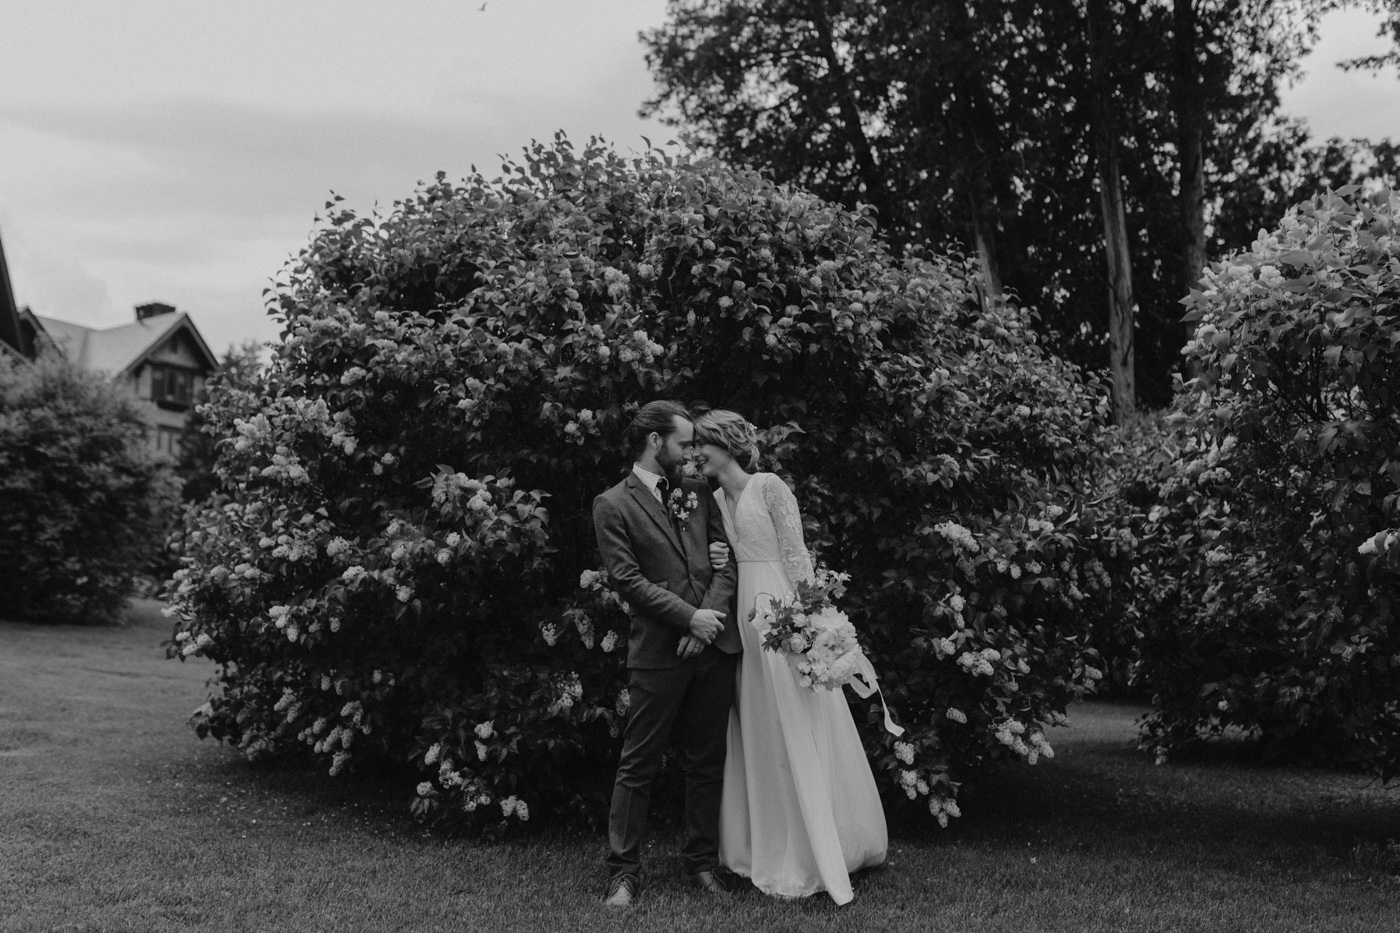 Erin-Mike-Intimate-Vintage-Wedding-Shelburne-Farms-Vermont -111.jpg